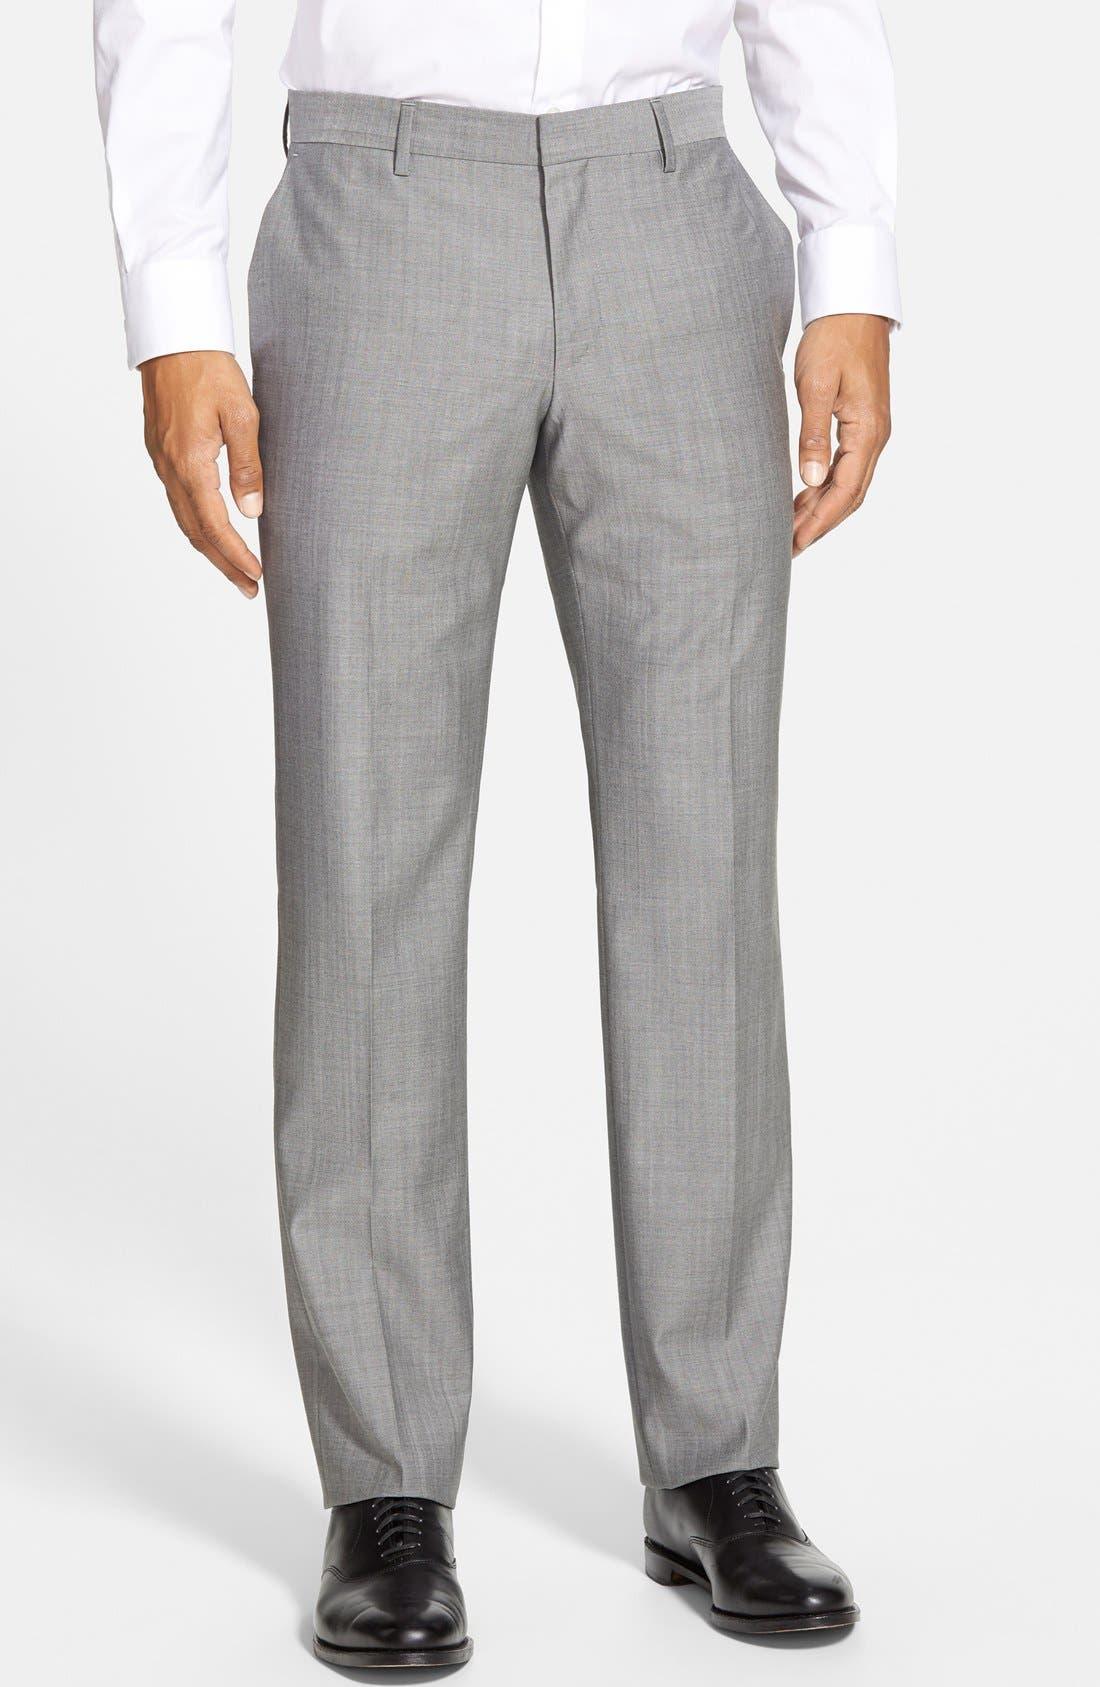 'Huge/Genius' Trim Fit Solid Wool Suit,                             Alternate thumbnail 12, color,                             PEARL GREY